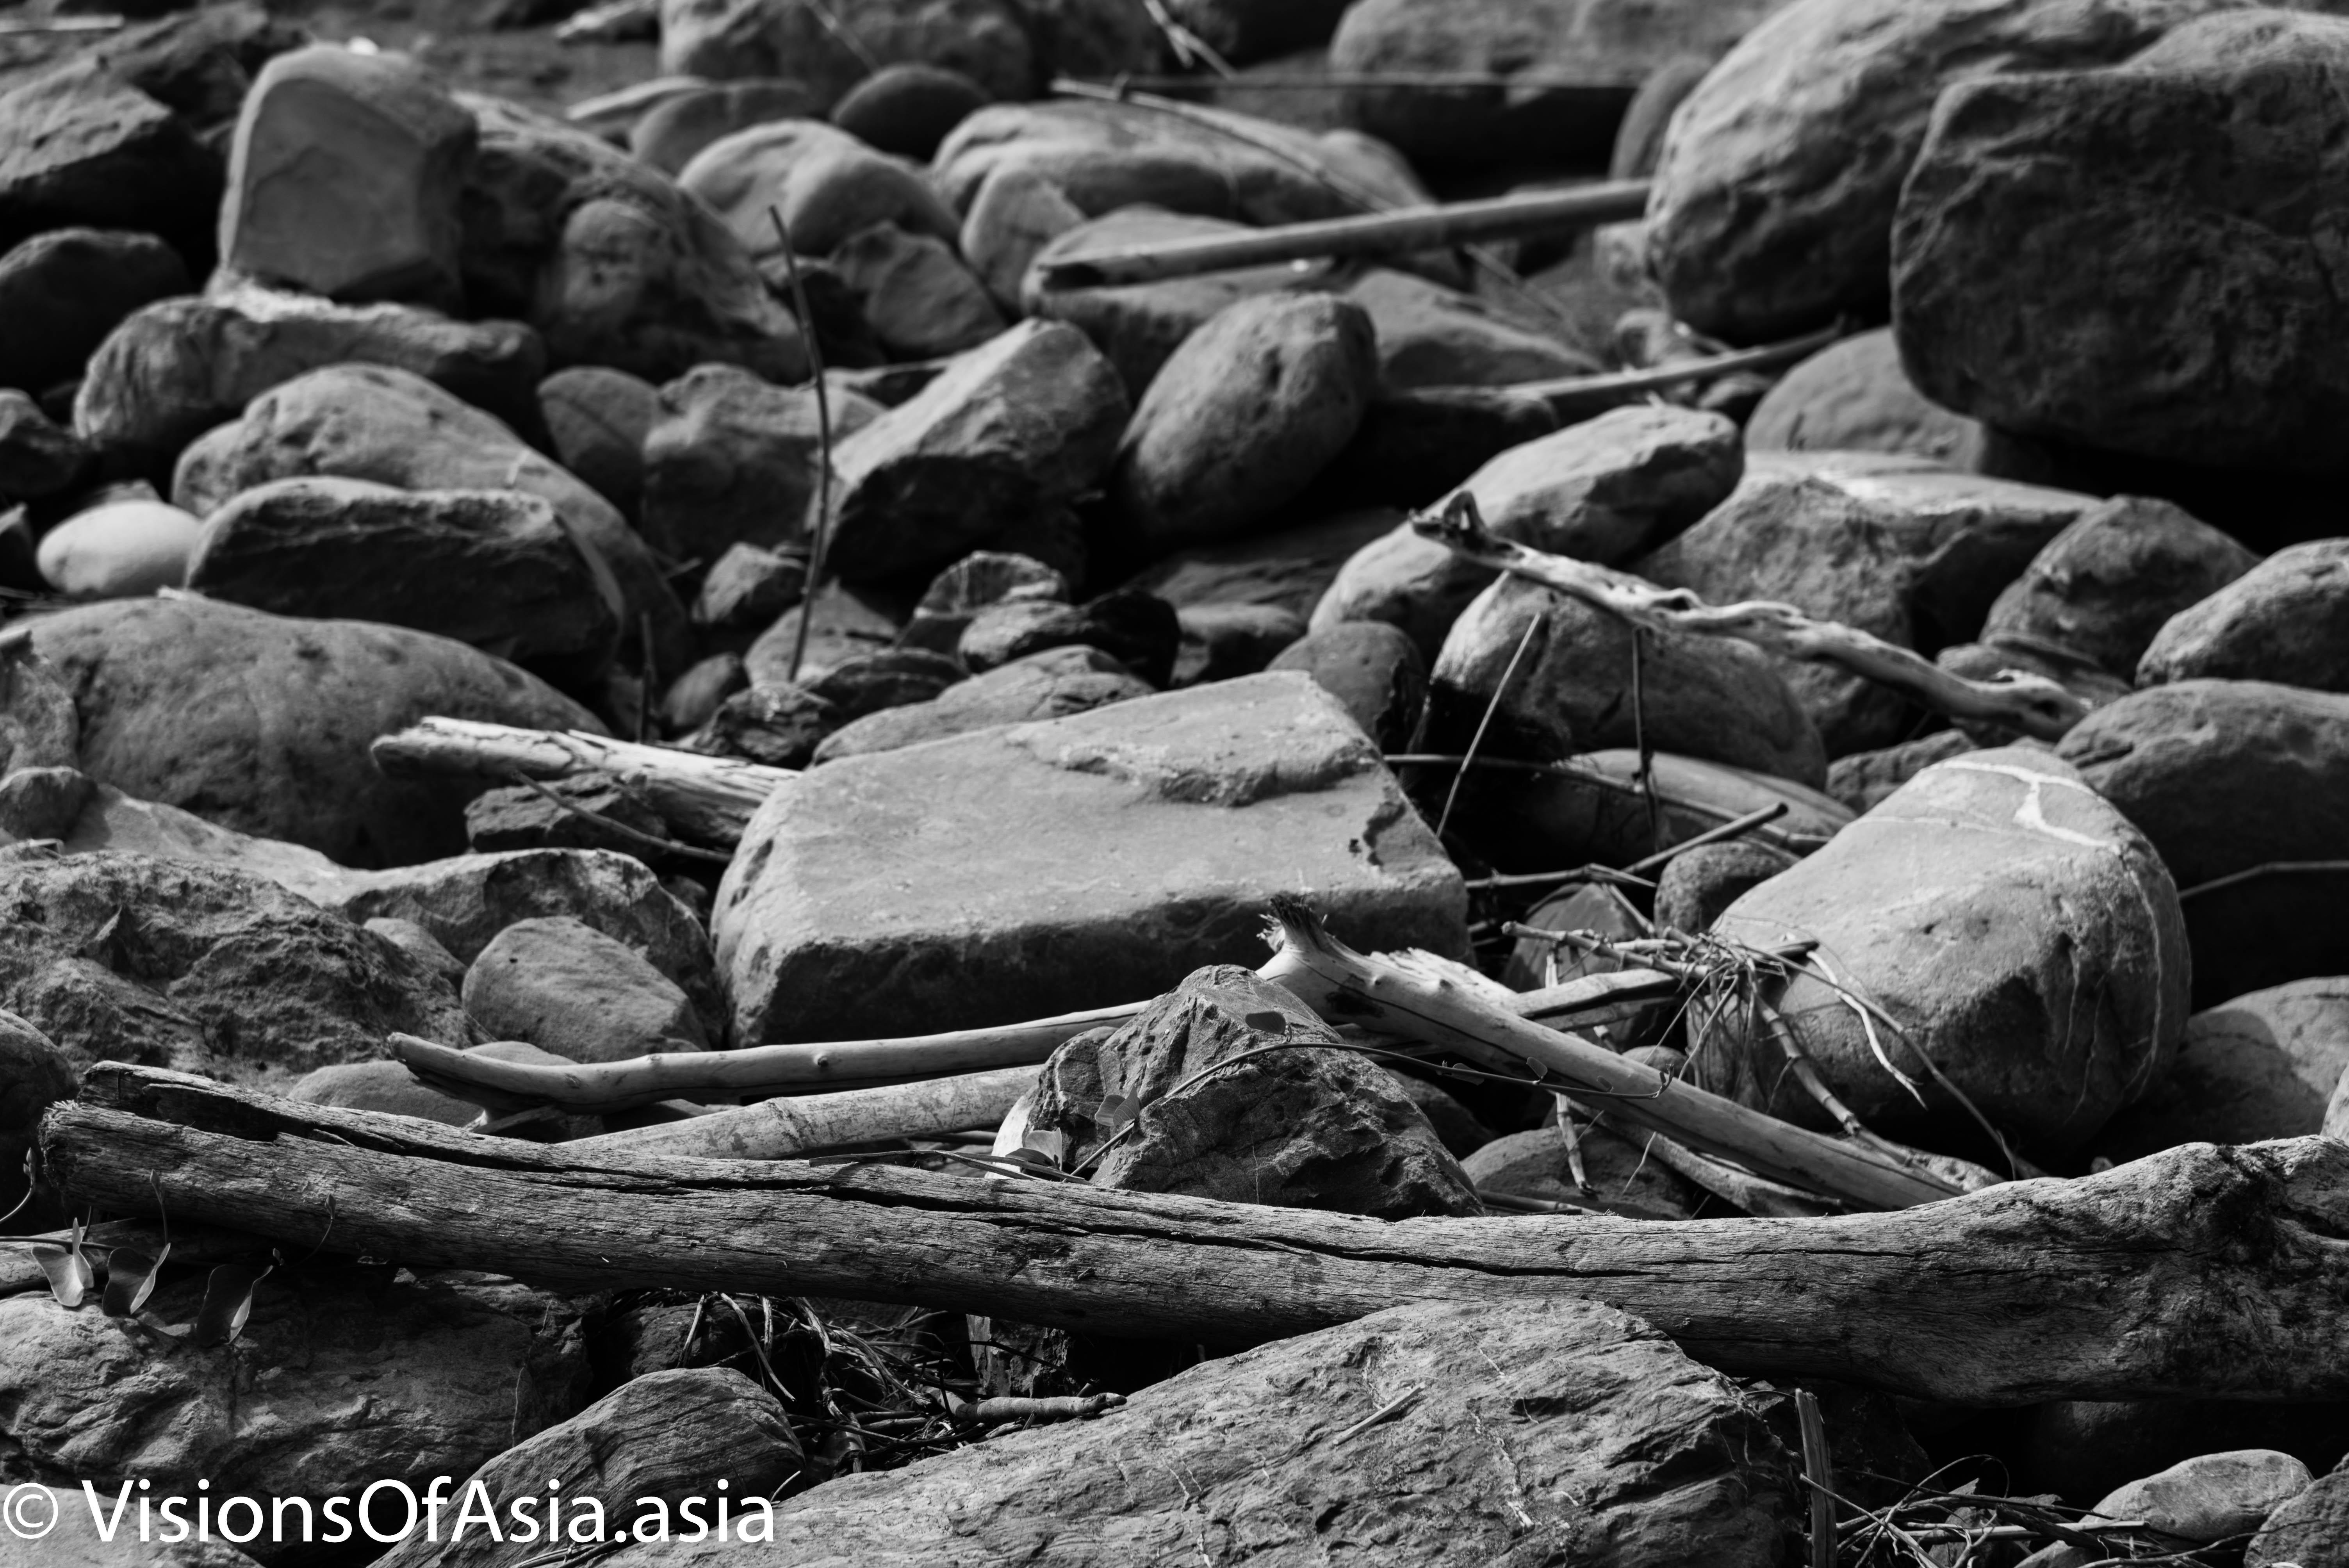 Beach debris Cijin island